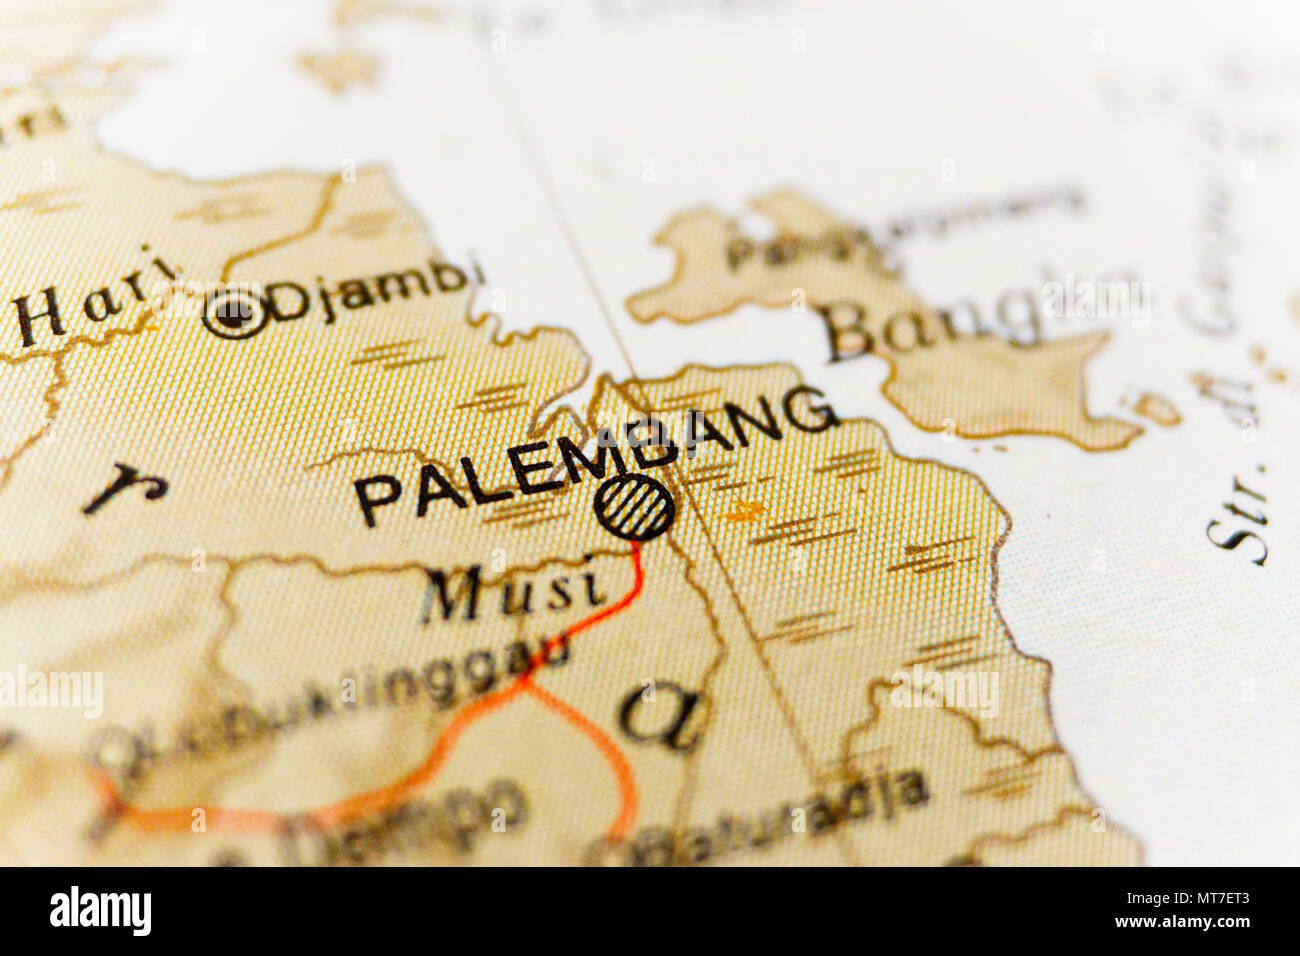 Palembang map. A close up shot of Palembang. Travel concept. Photo stock. - Stock Image